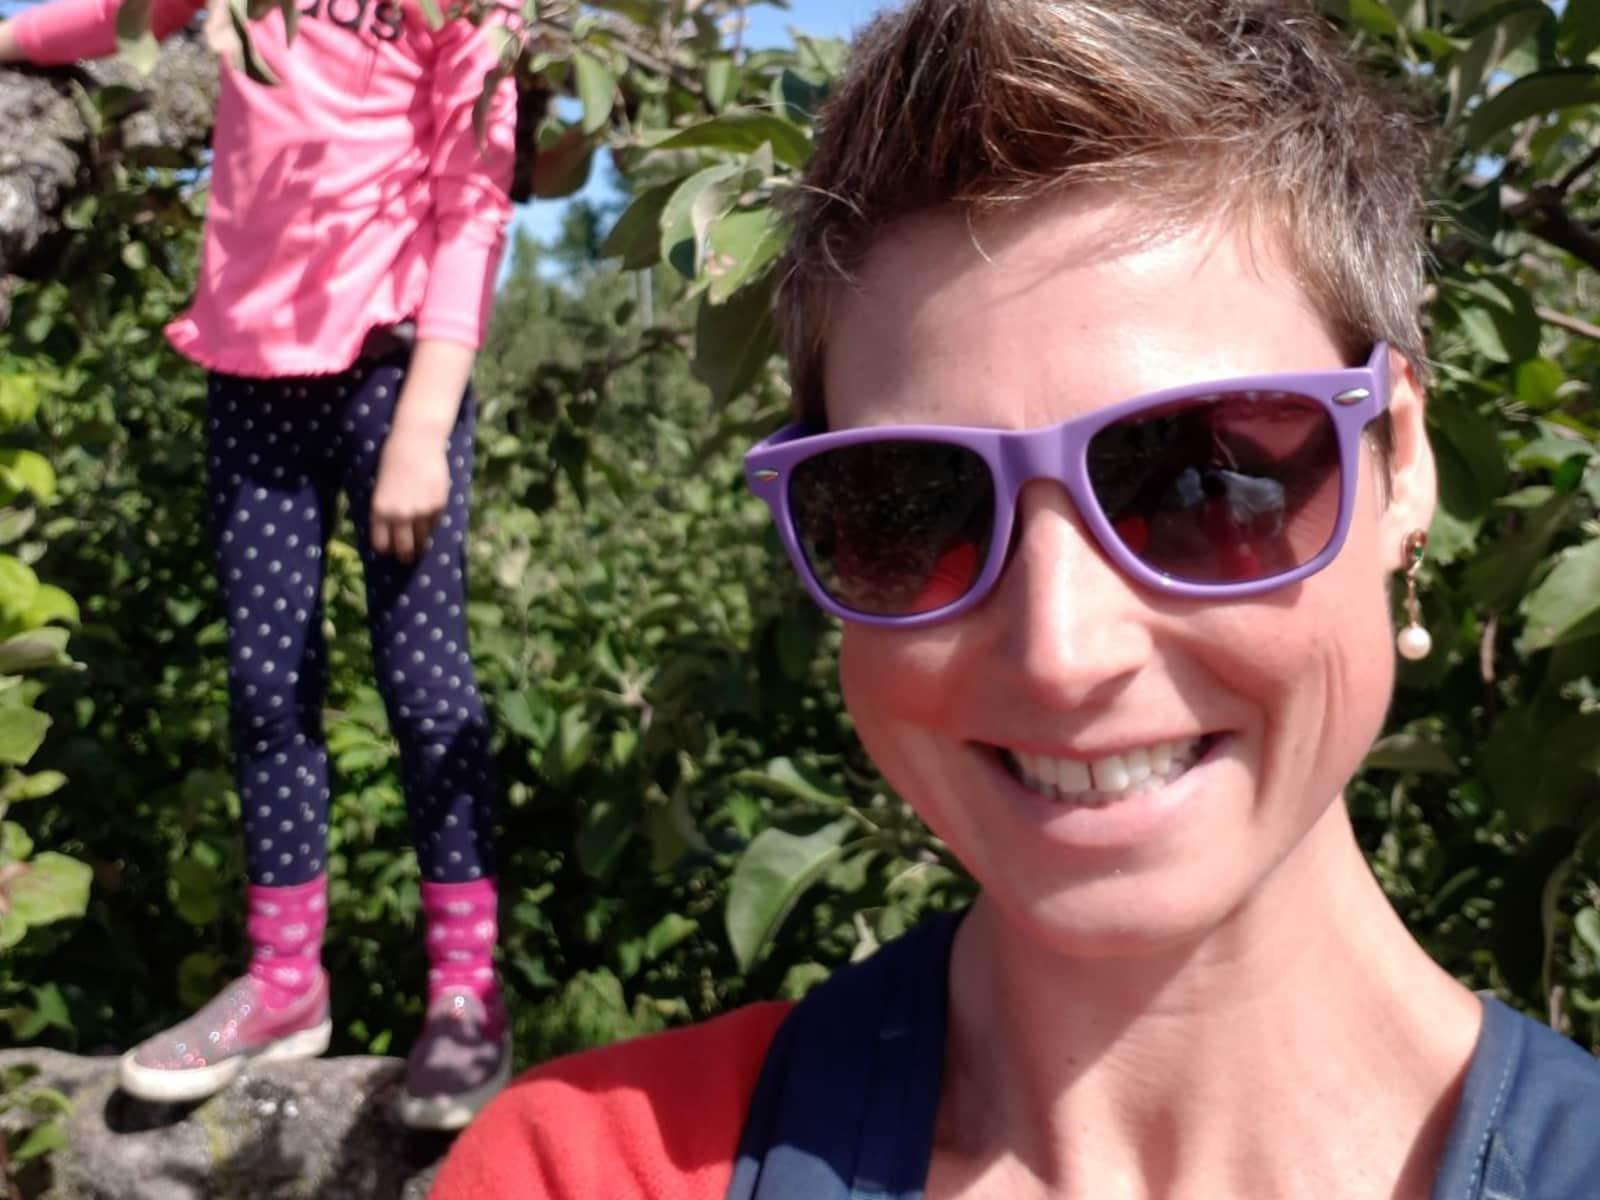 Erica from Ottawa, Ontario, Canada